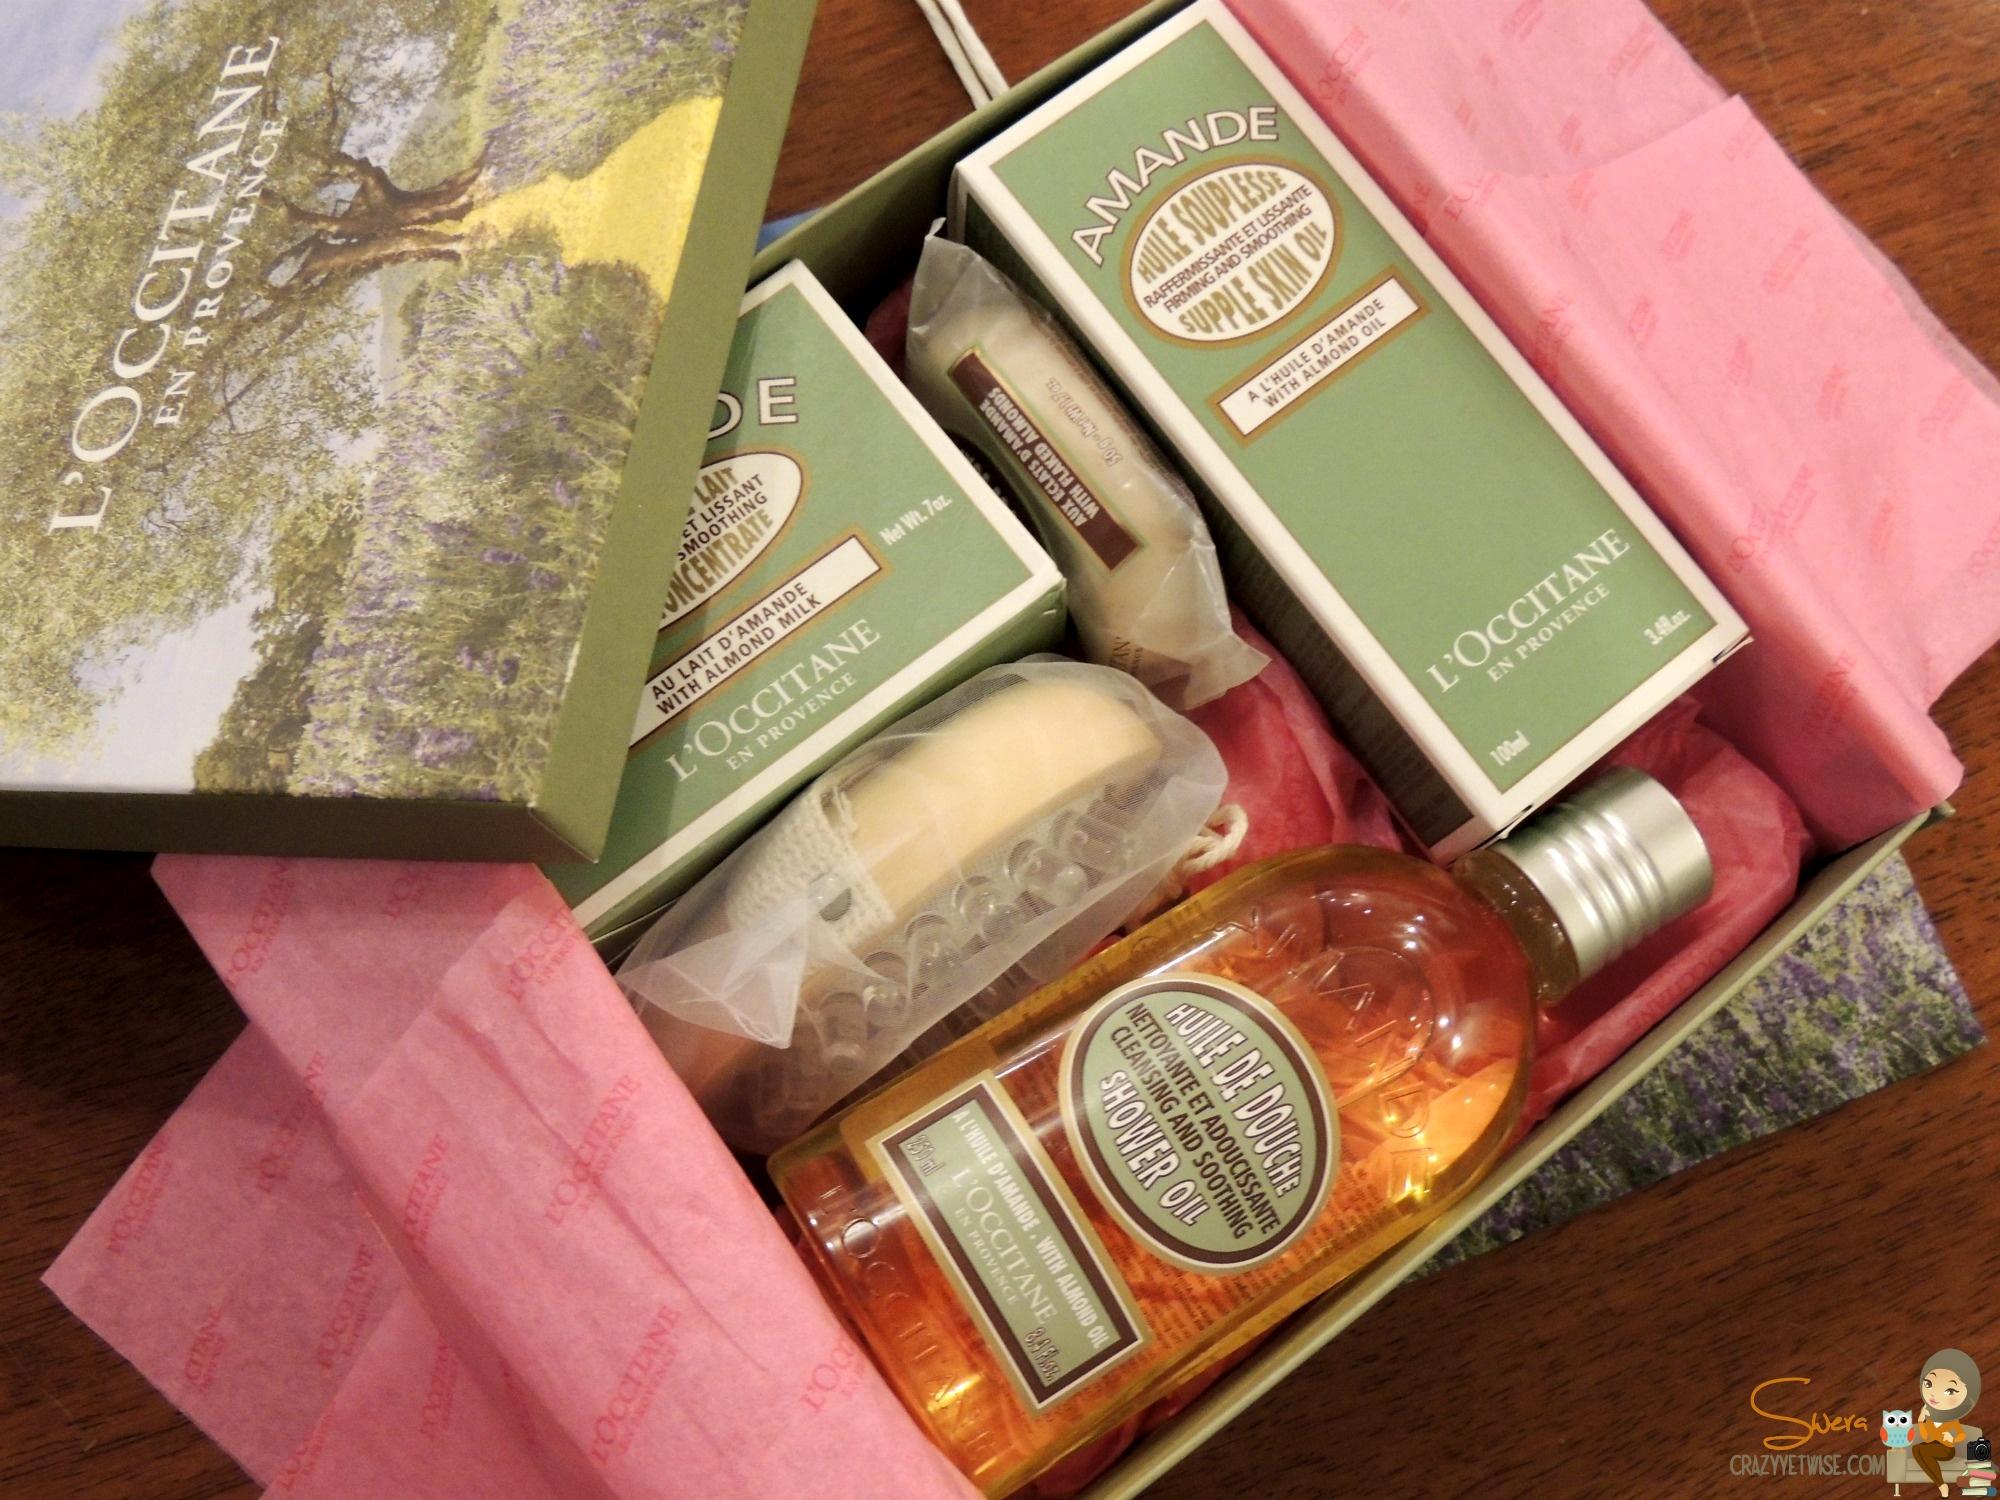 L'Occitane April's Beauty Box   Crazy Yet Wise